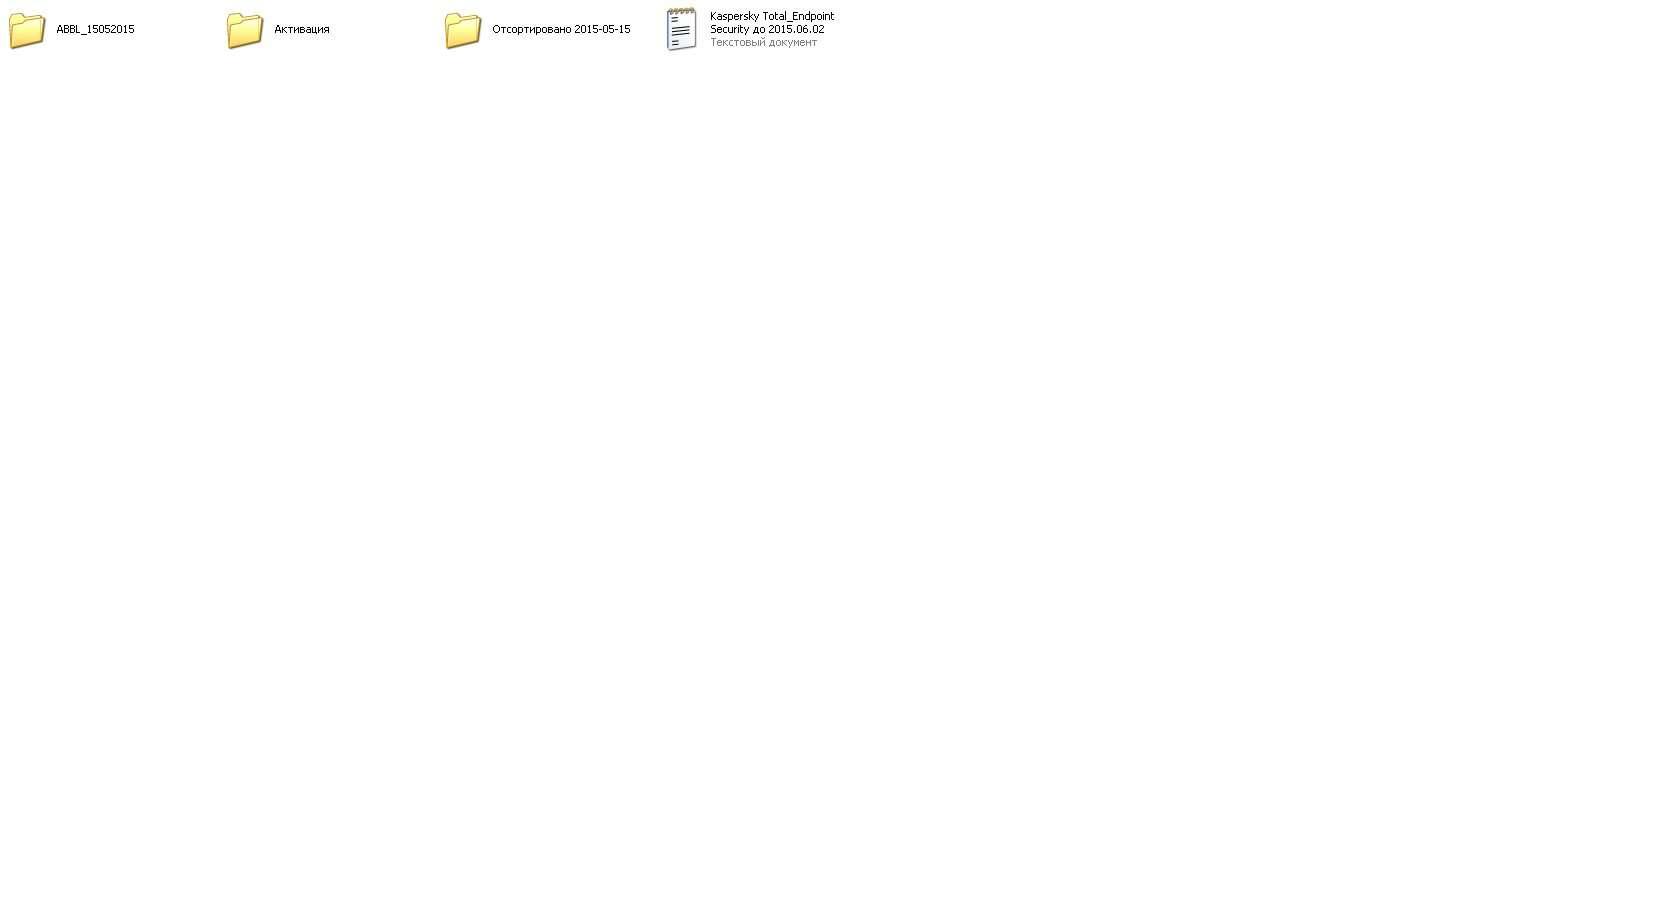 ����� ��� ESET NOD32, Kaspersky, Avast, Avira 30.11.15 [Ru]